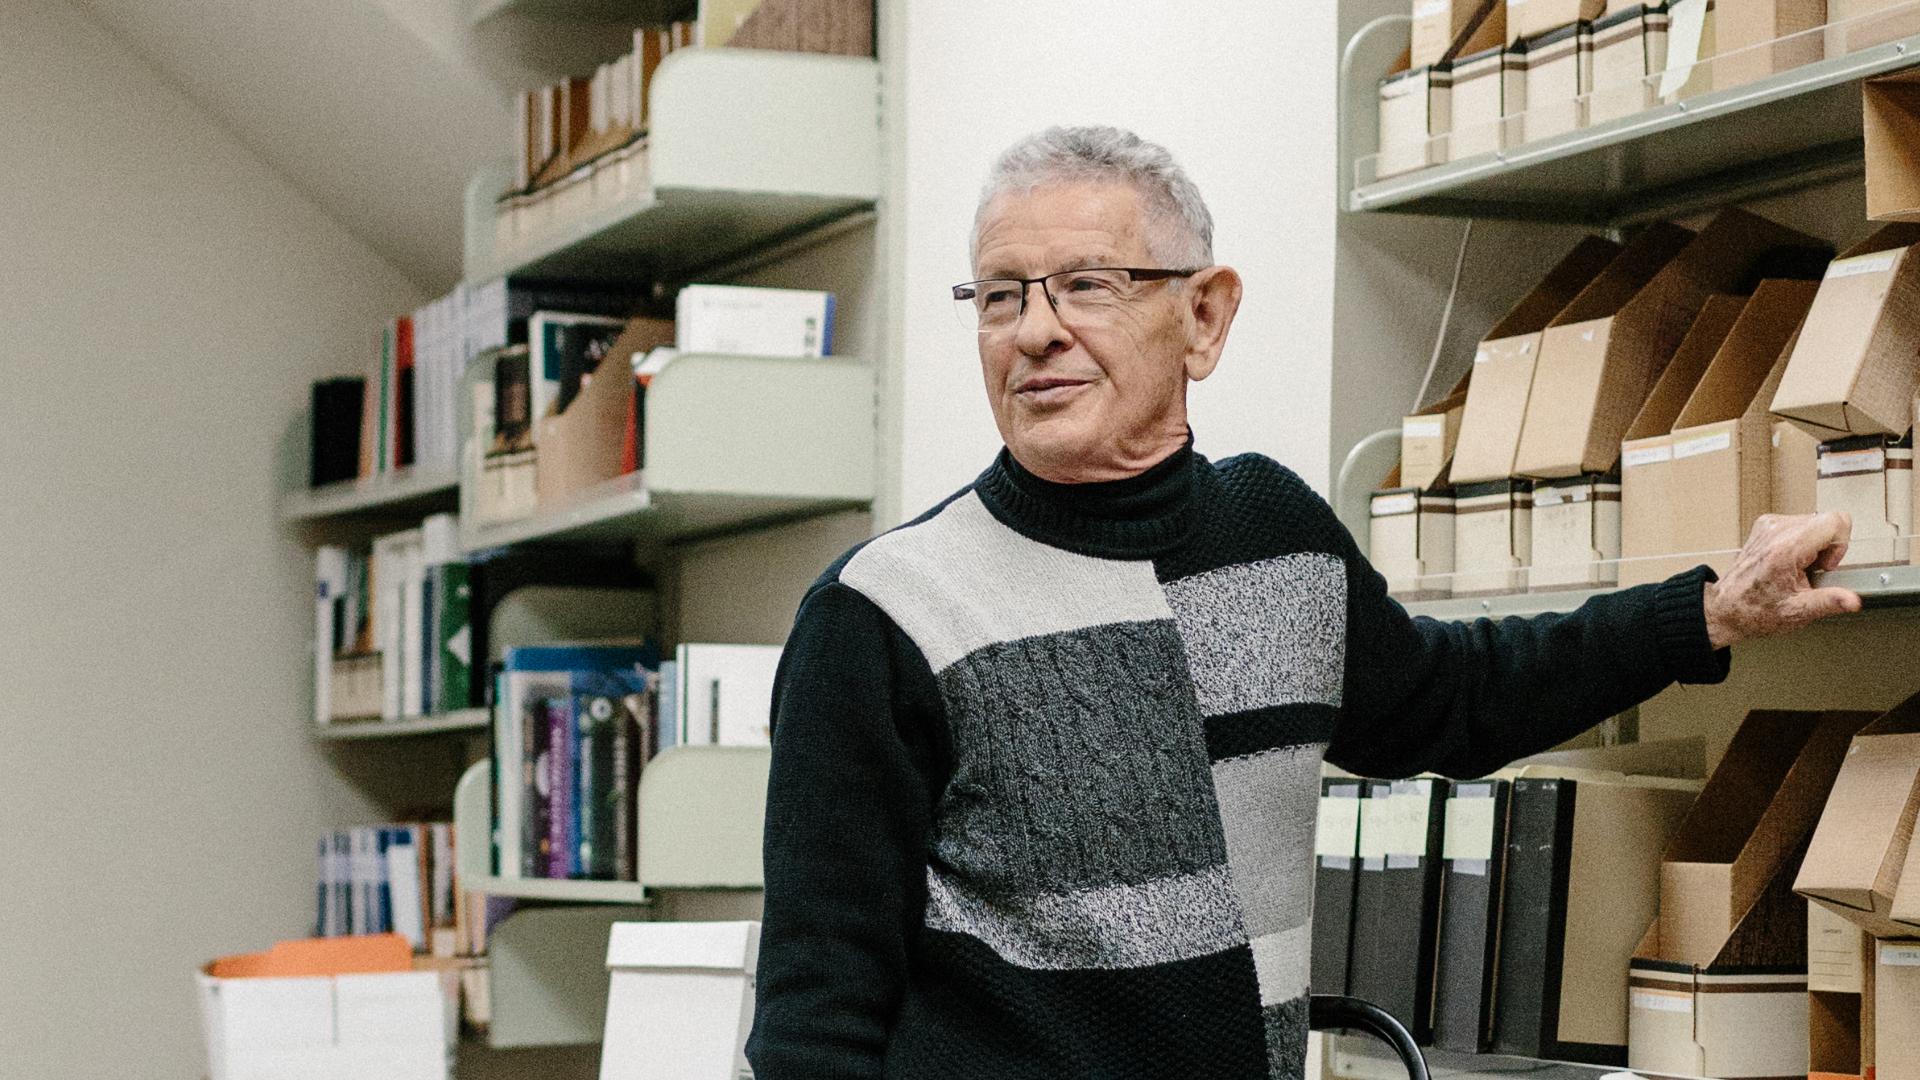 Marcus Feldman in his office at Stanford University, CA